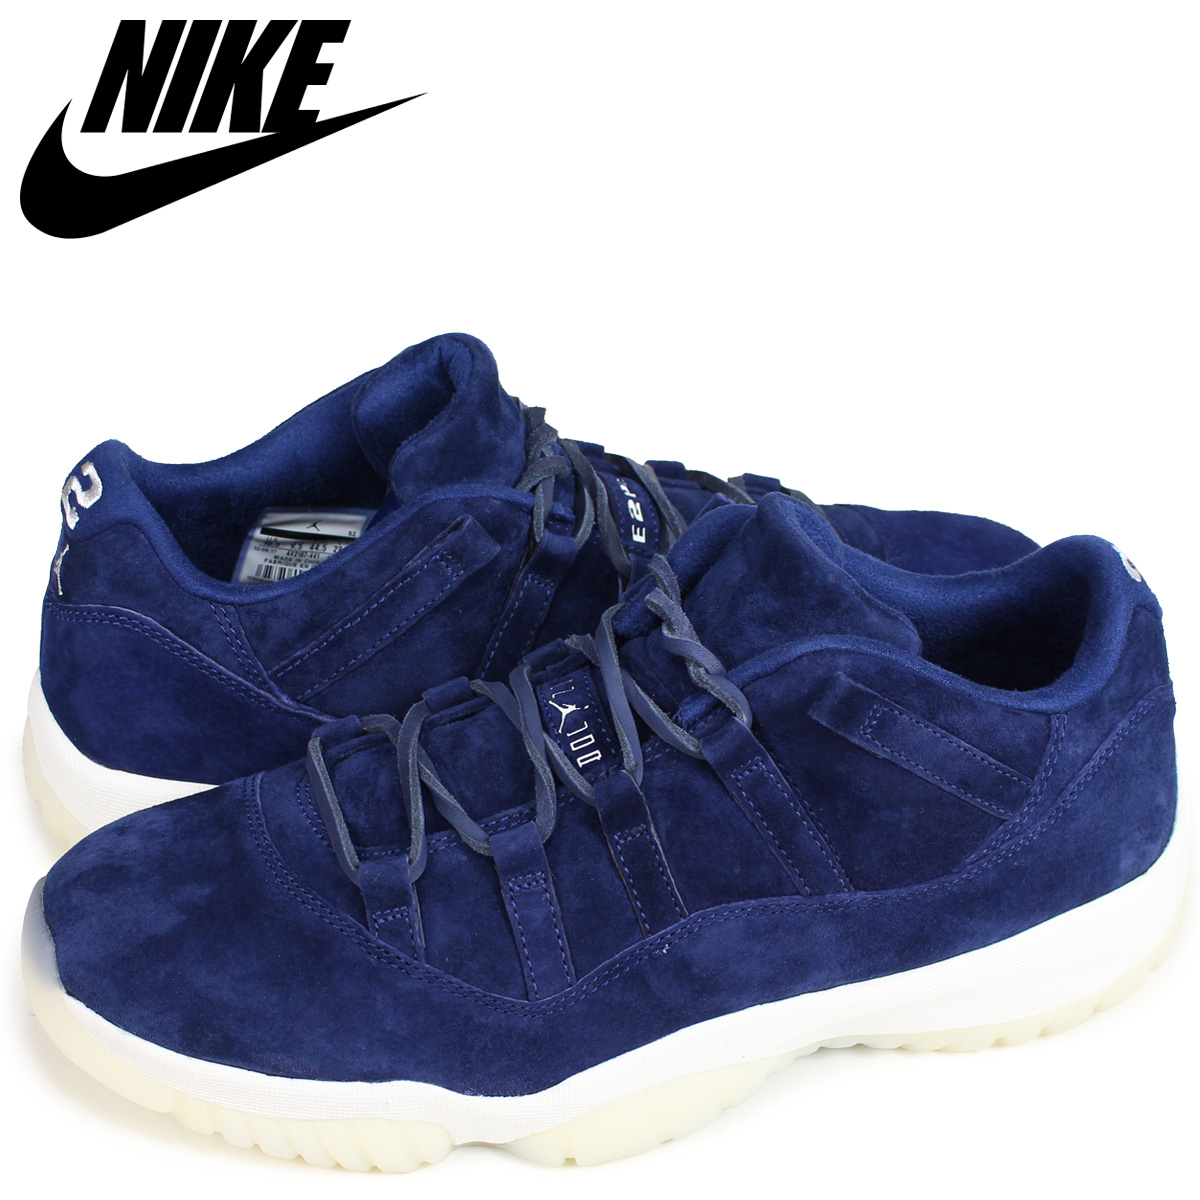 9c5a965f379 NIKE Nike Air Jordan 11 nostalgic sneakers men AIR JORDAN 11 RETRO LOW  RE2PECT AV2187-441 blue